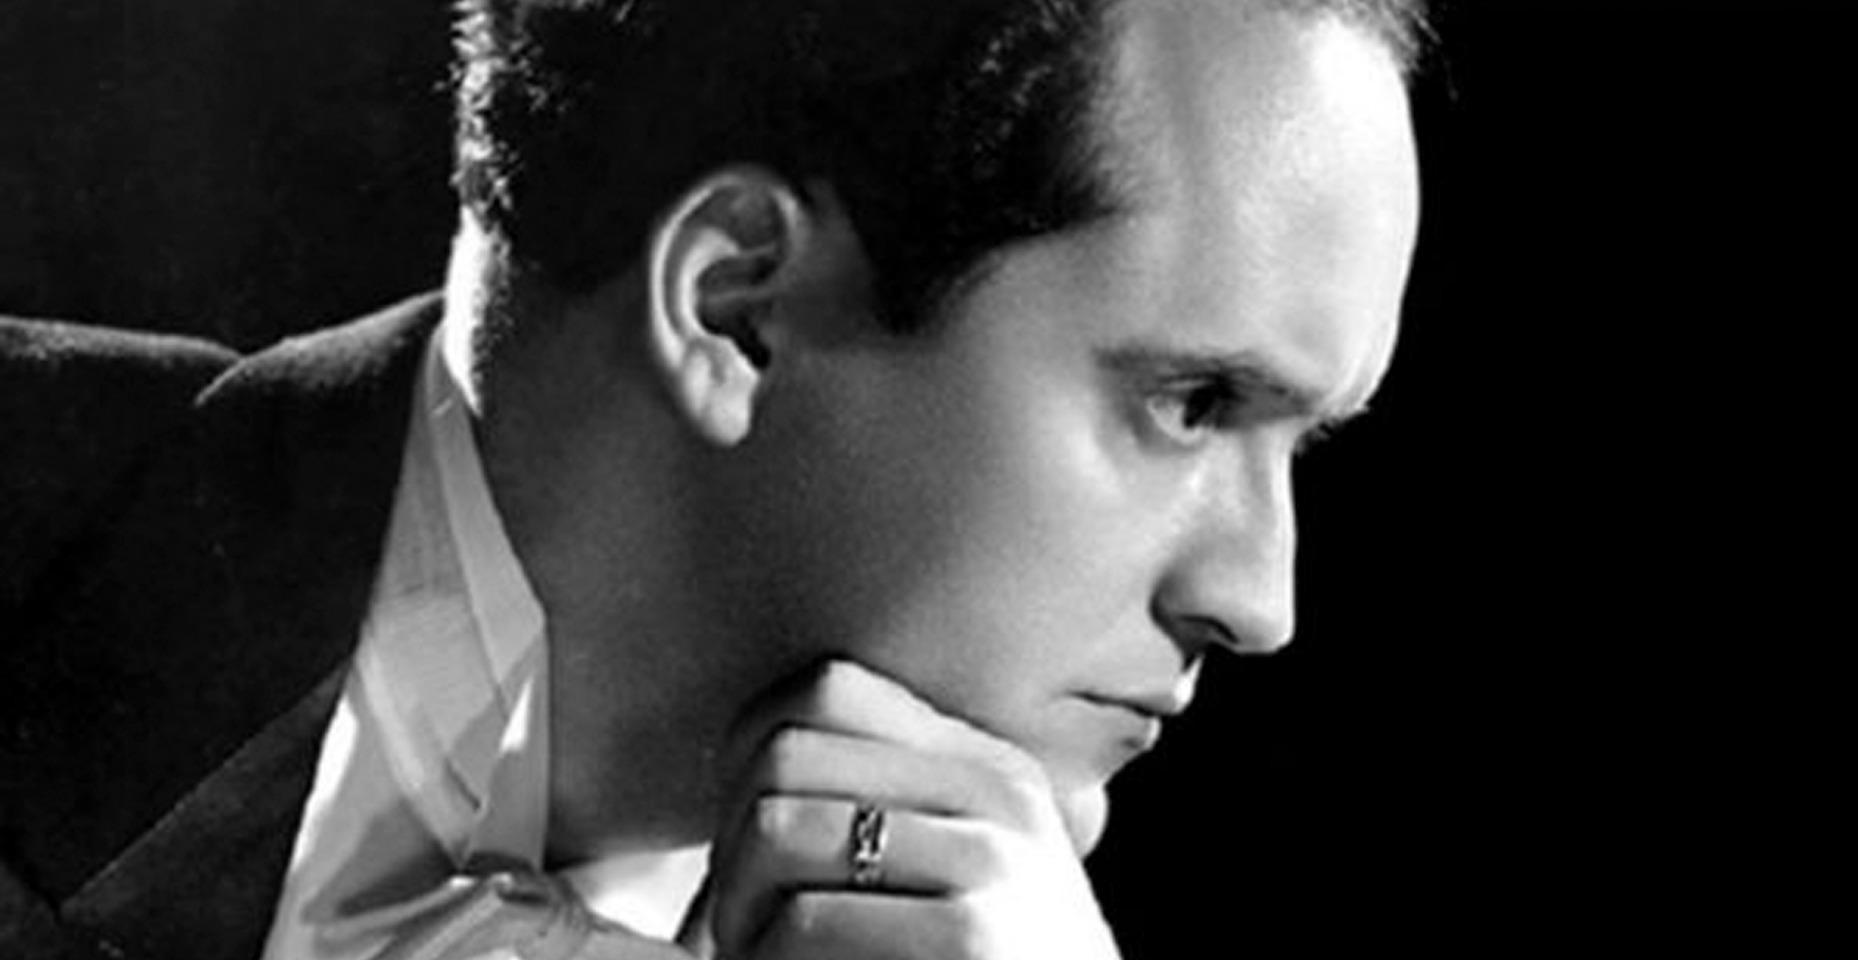 Miguel Bernal Jiménez